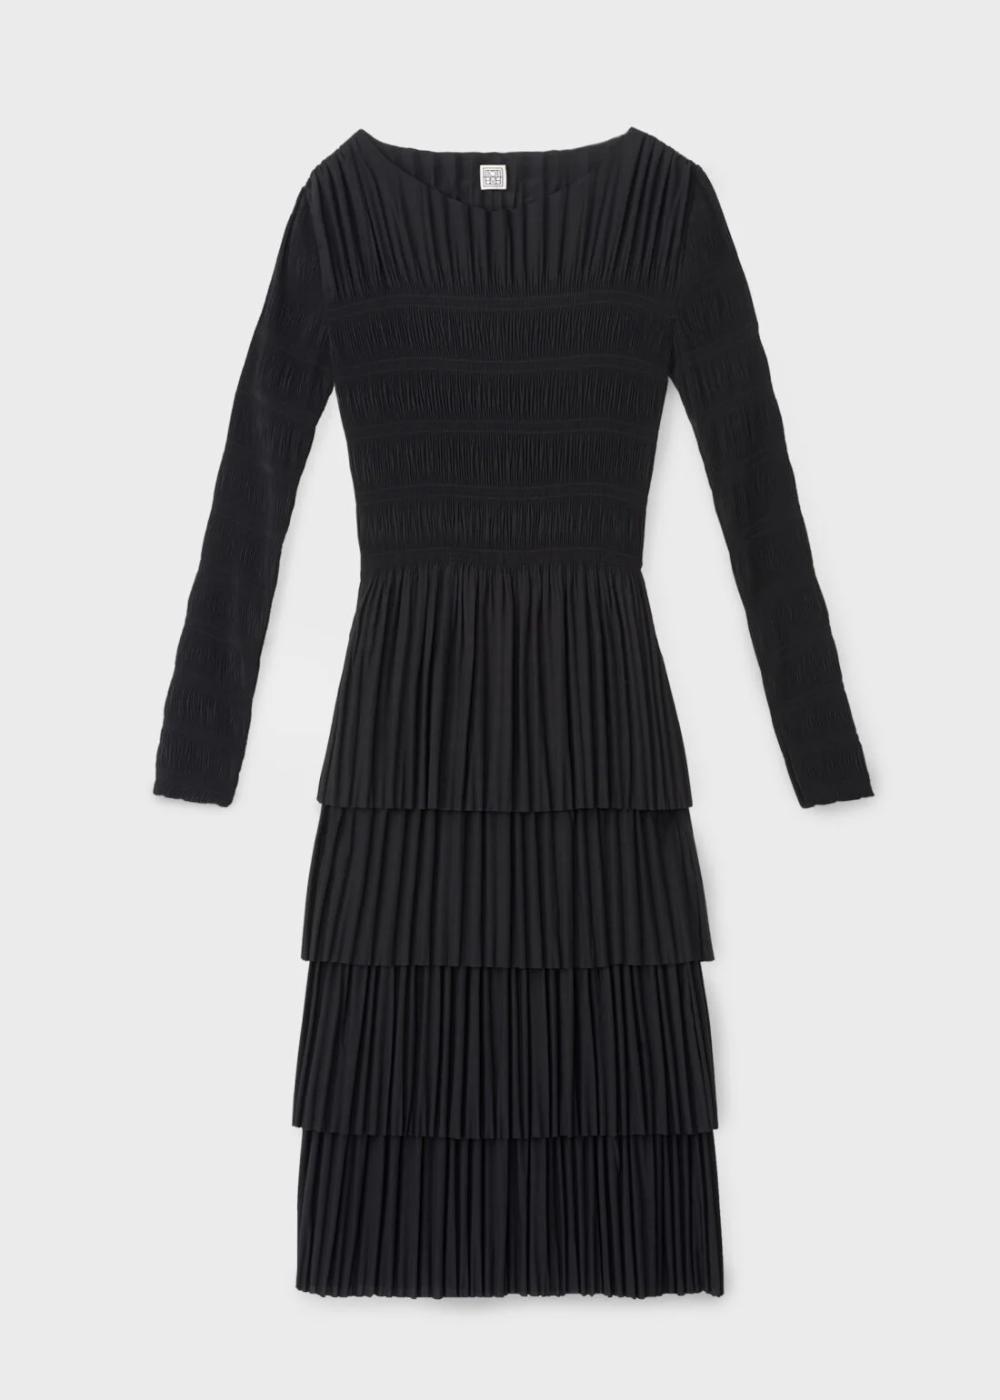 Dresses Skirts Dress Skirt Dresses Black Dress [ 1400 x 1000 Pixel ]